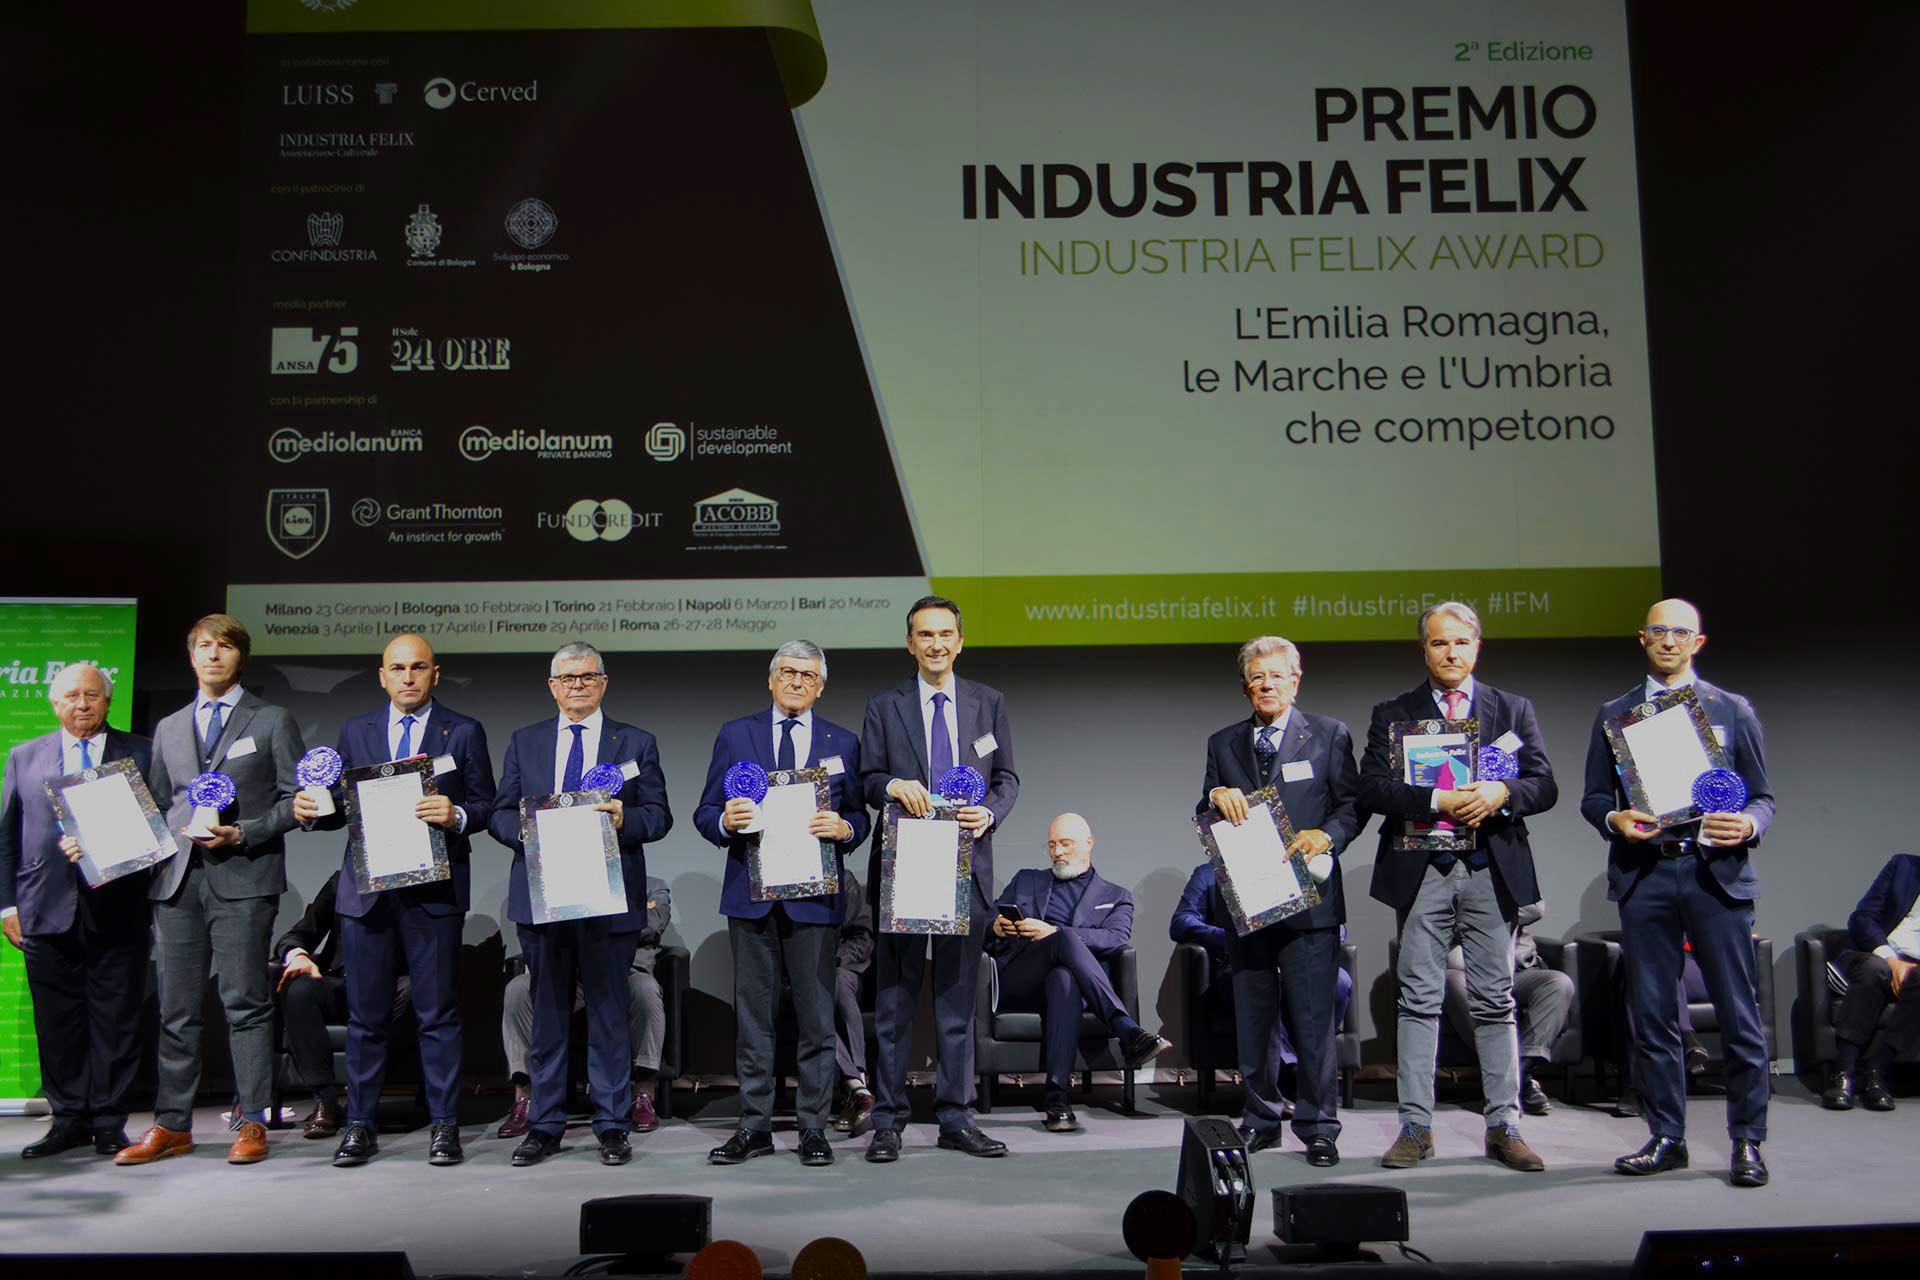 Felix Industria Prize